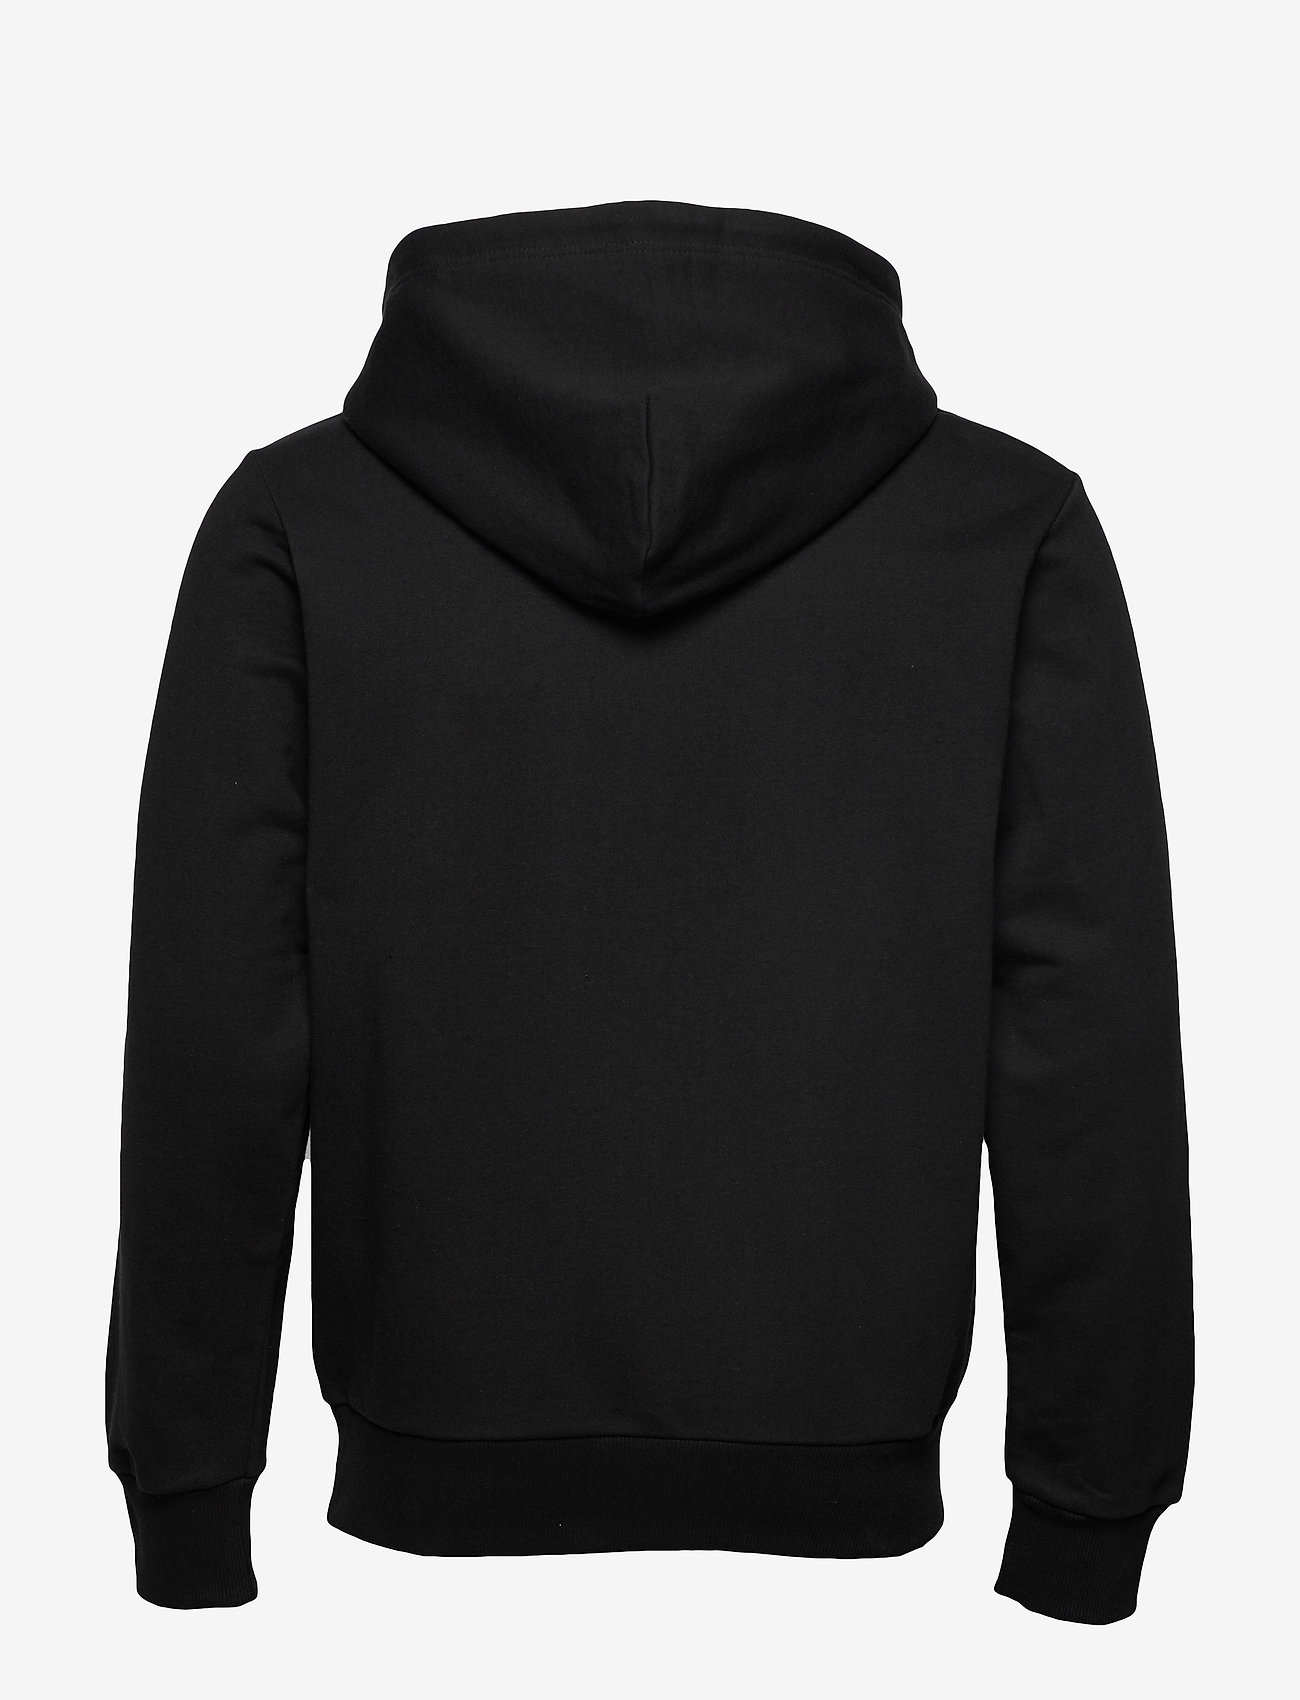 Diesel Men - S-GIR-HOOD-DIVISION-LOGO SWEAT-SHIR - hoodies - black - 1